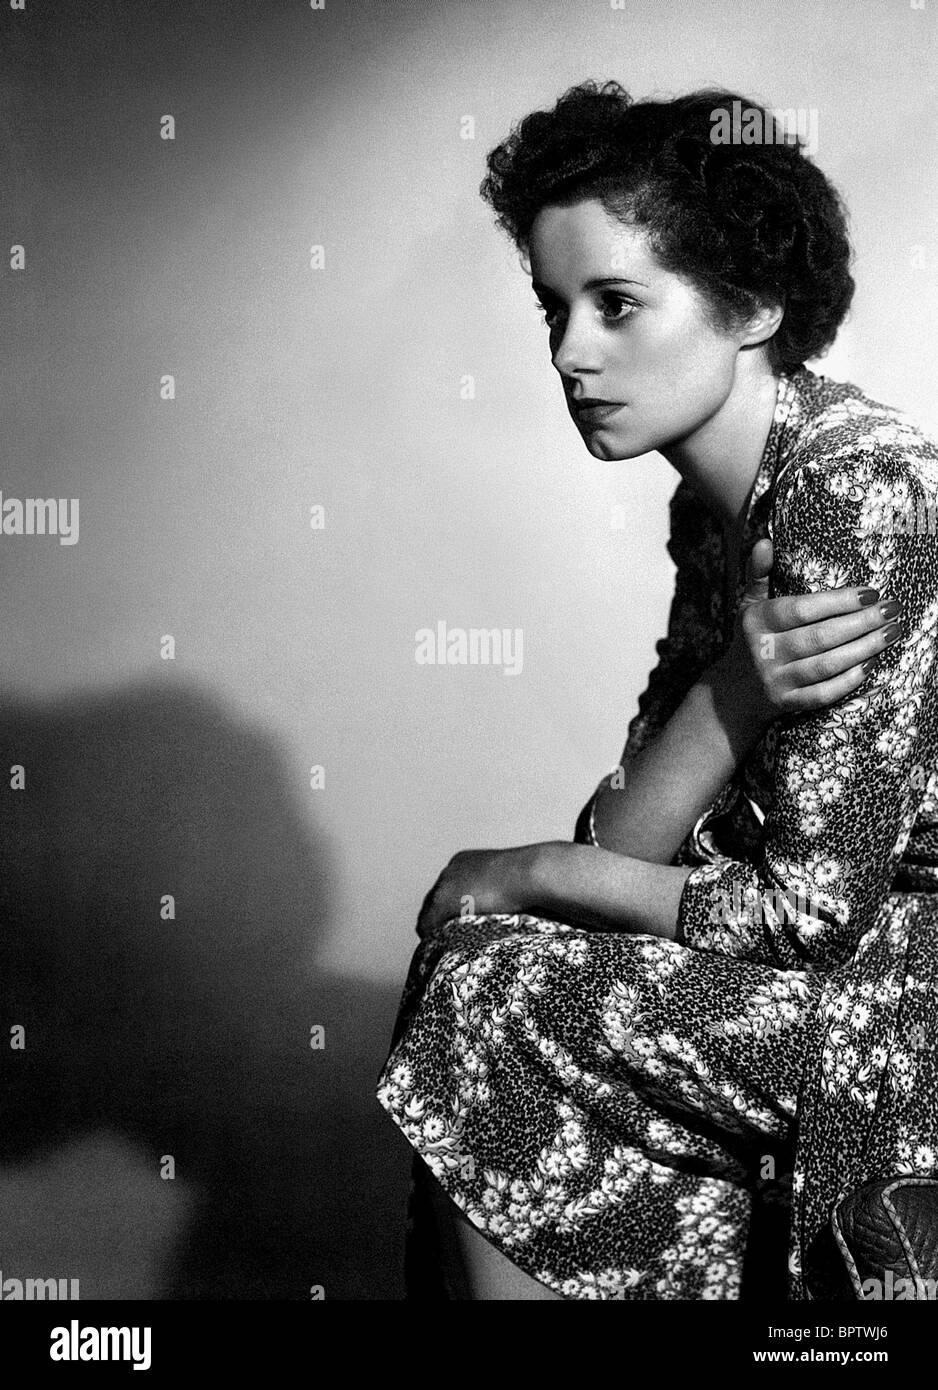 ELSA LANCHESTER ACTRESS (1934) - Stock Image